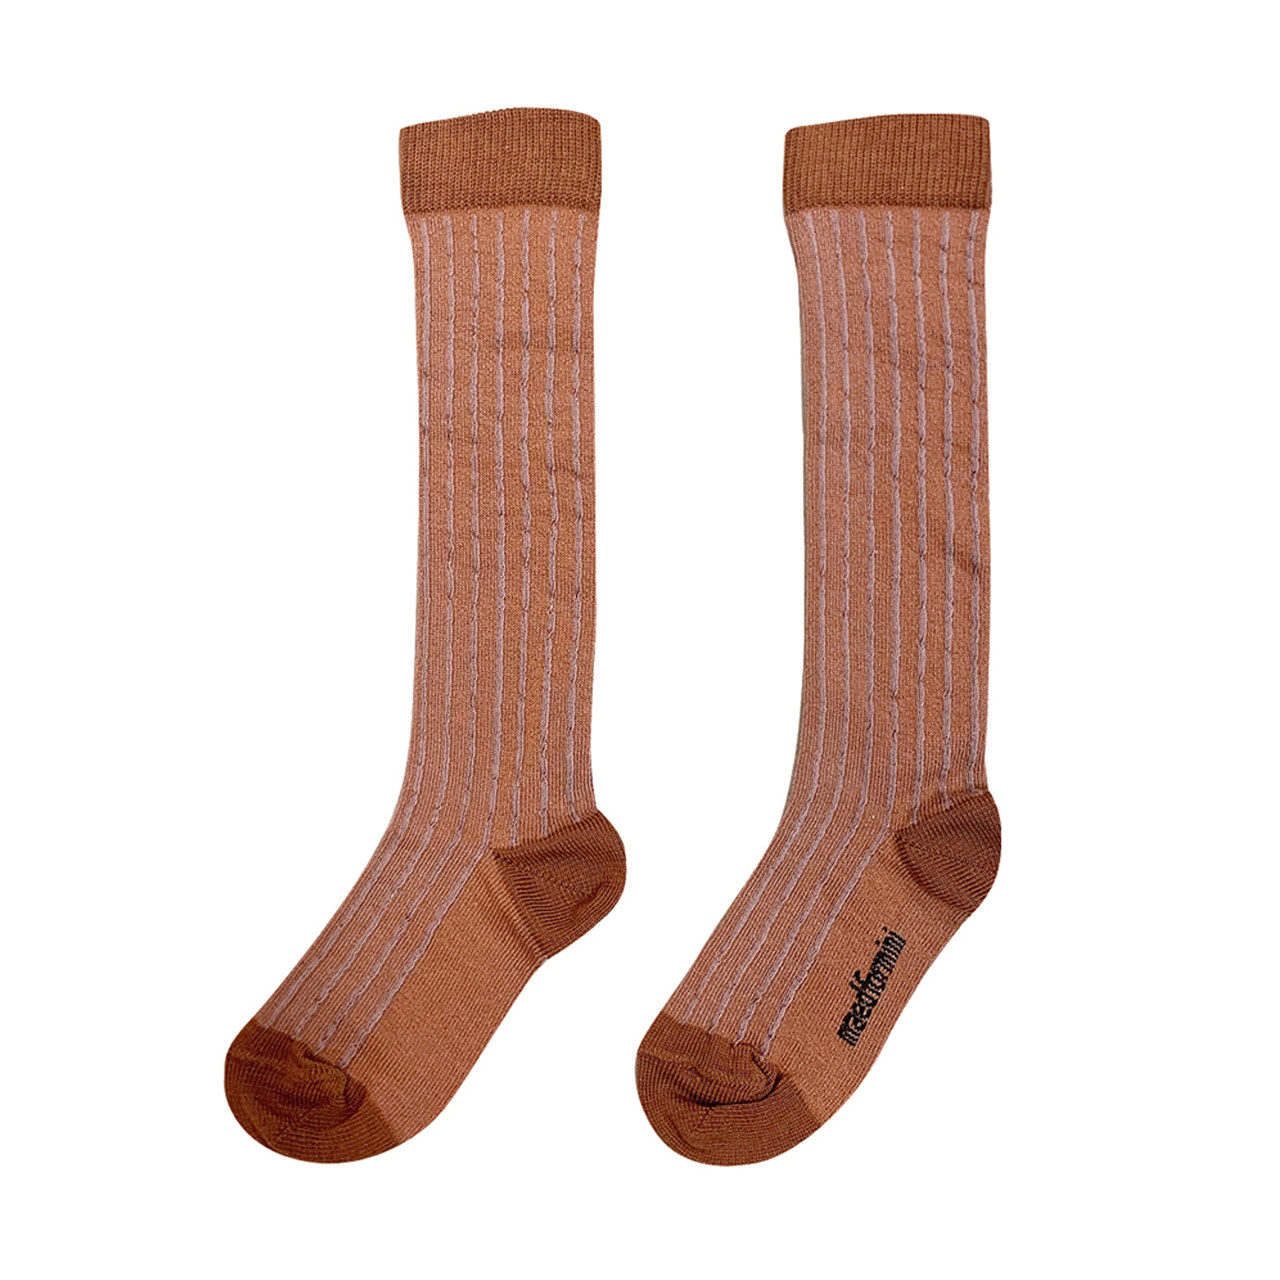 Maed For mini Maed for mini - Knee socks keen kangaroo